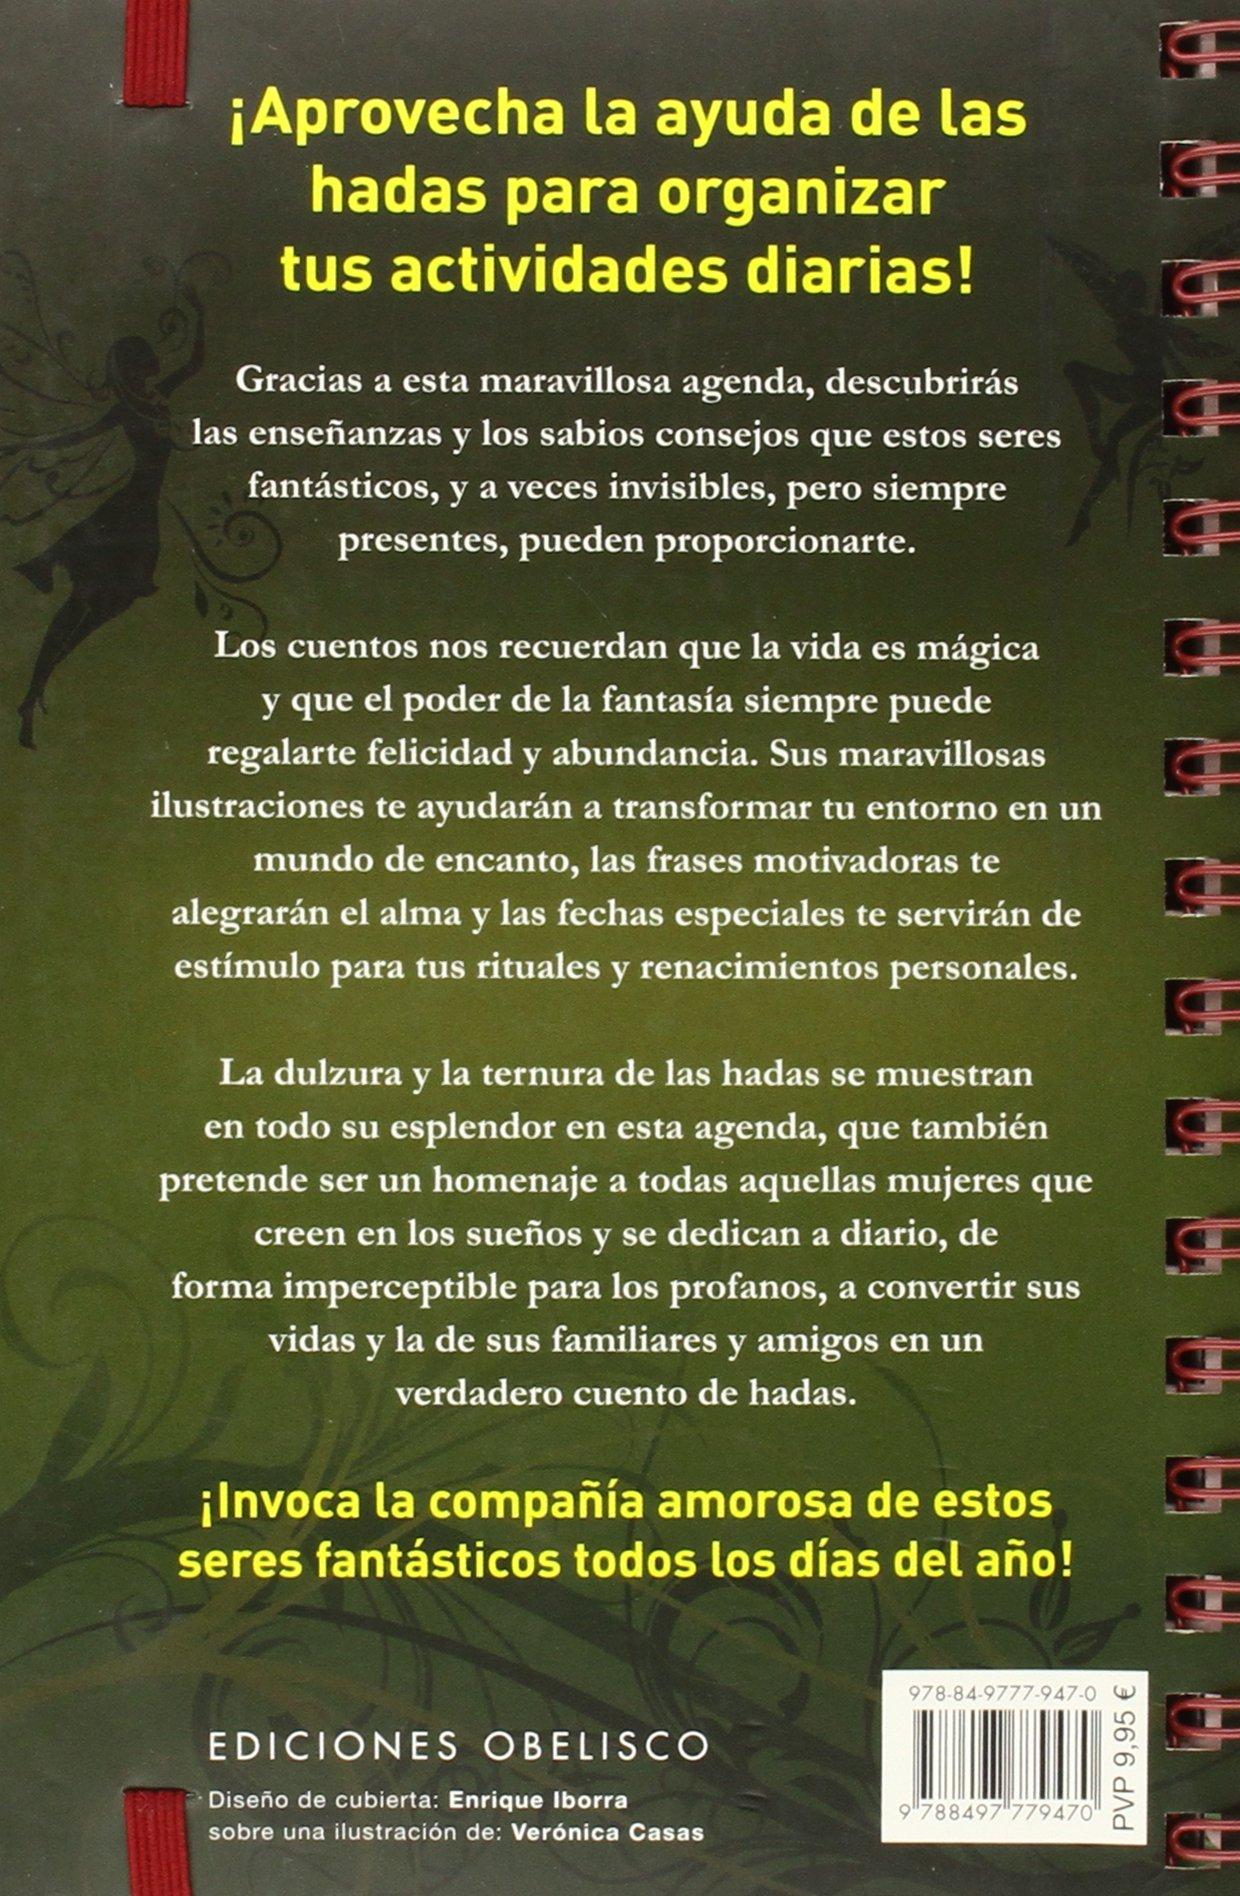 2014 Agenda hadas (AGENDAS): Amazon.es: Vv.Aa.: Libros